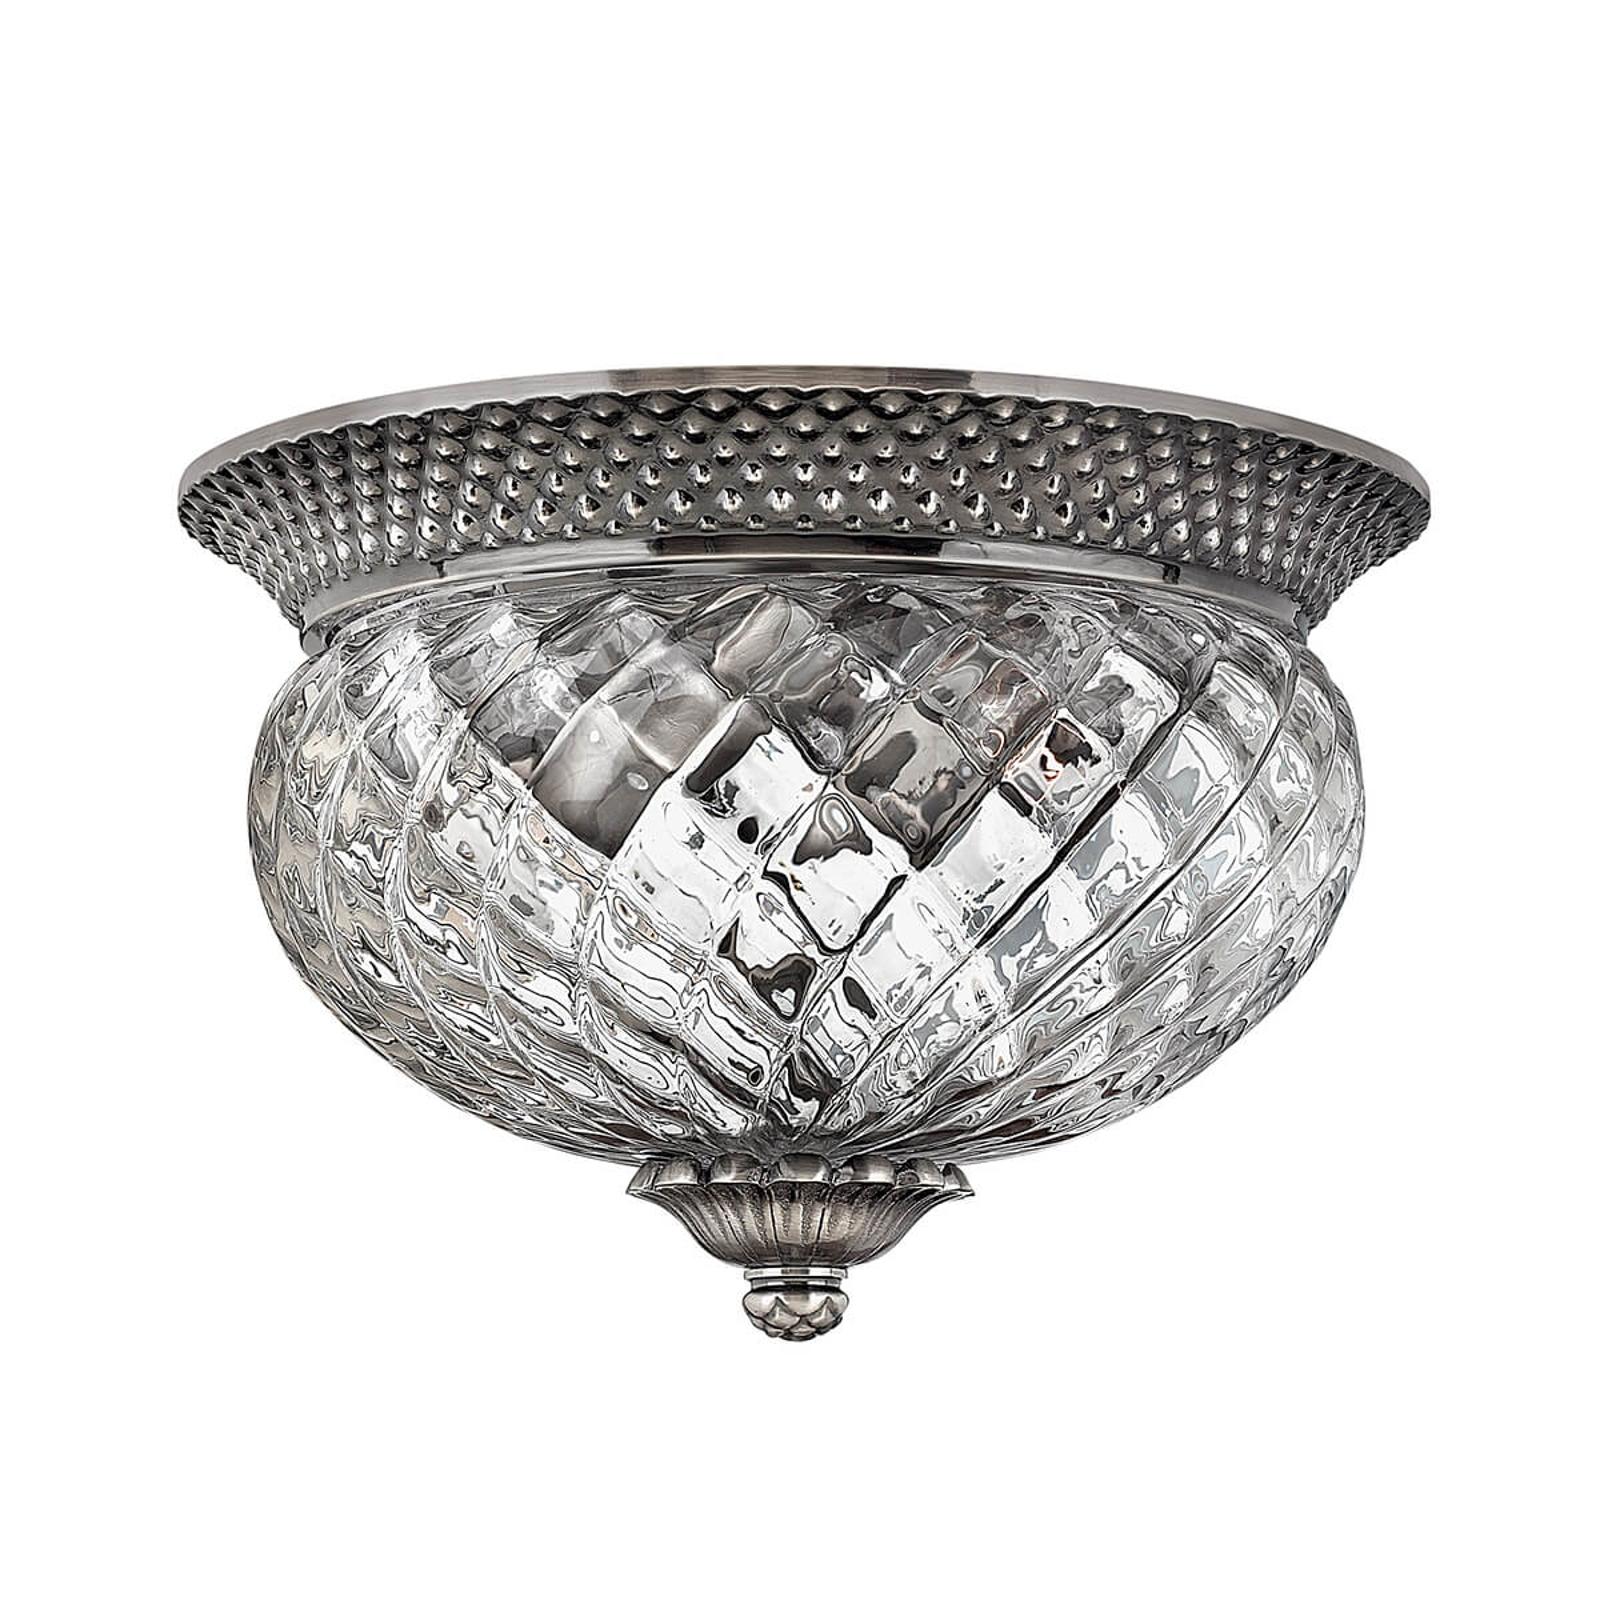 Plafondlamp Plantation antiek nikkel, 30,5 cm